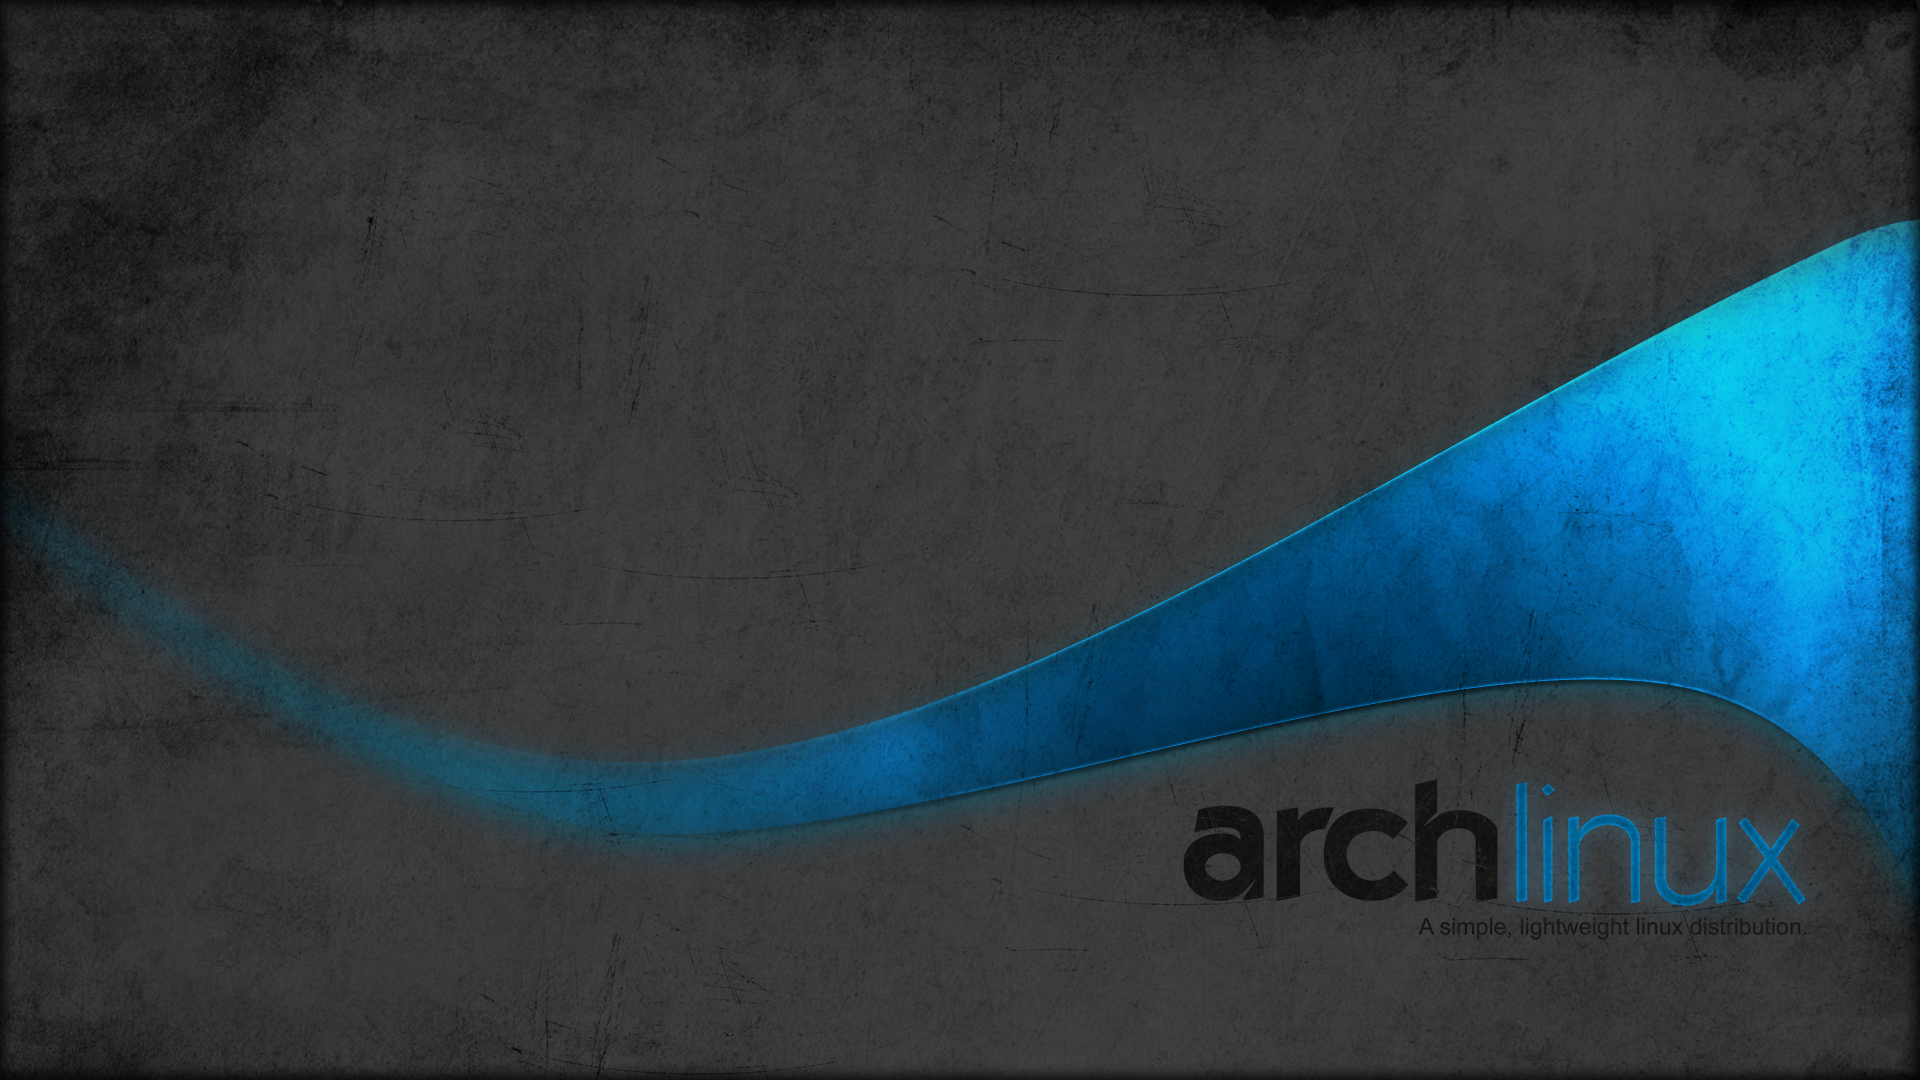 Arch Linux Wallpaper 1920X1080 wallpaper   842585 1920x1080